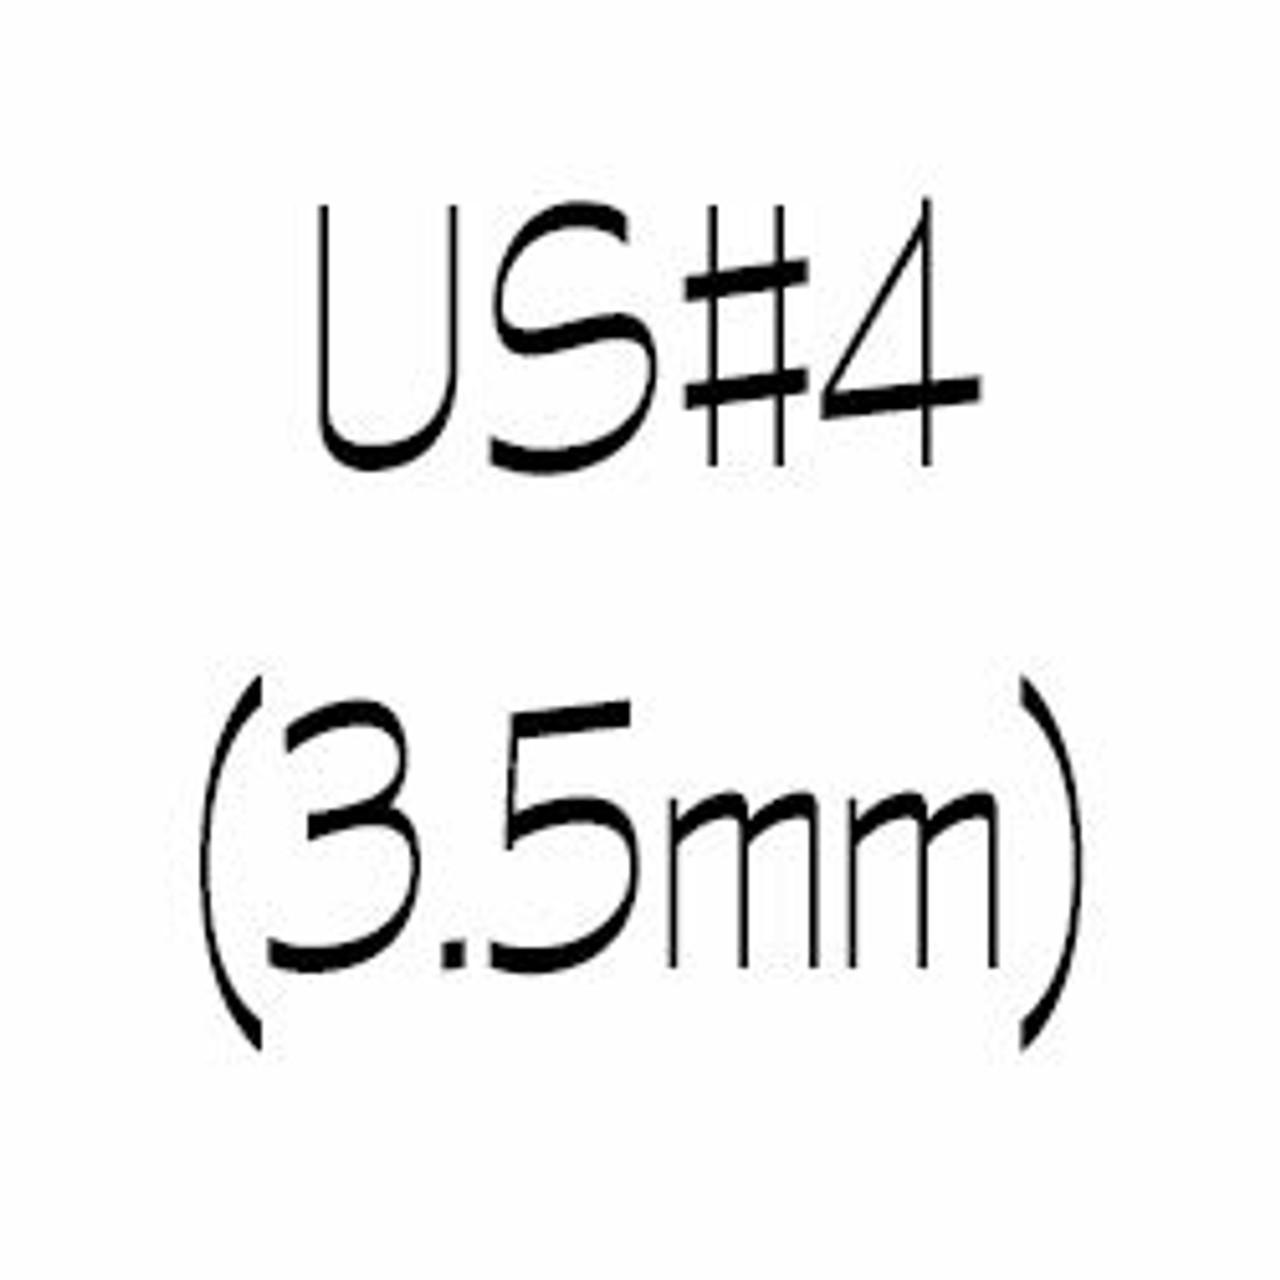 US#4 (3.5mm) Single Point Knitting Needles